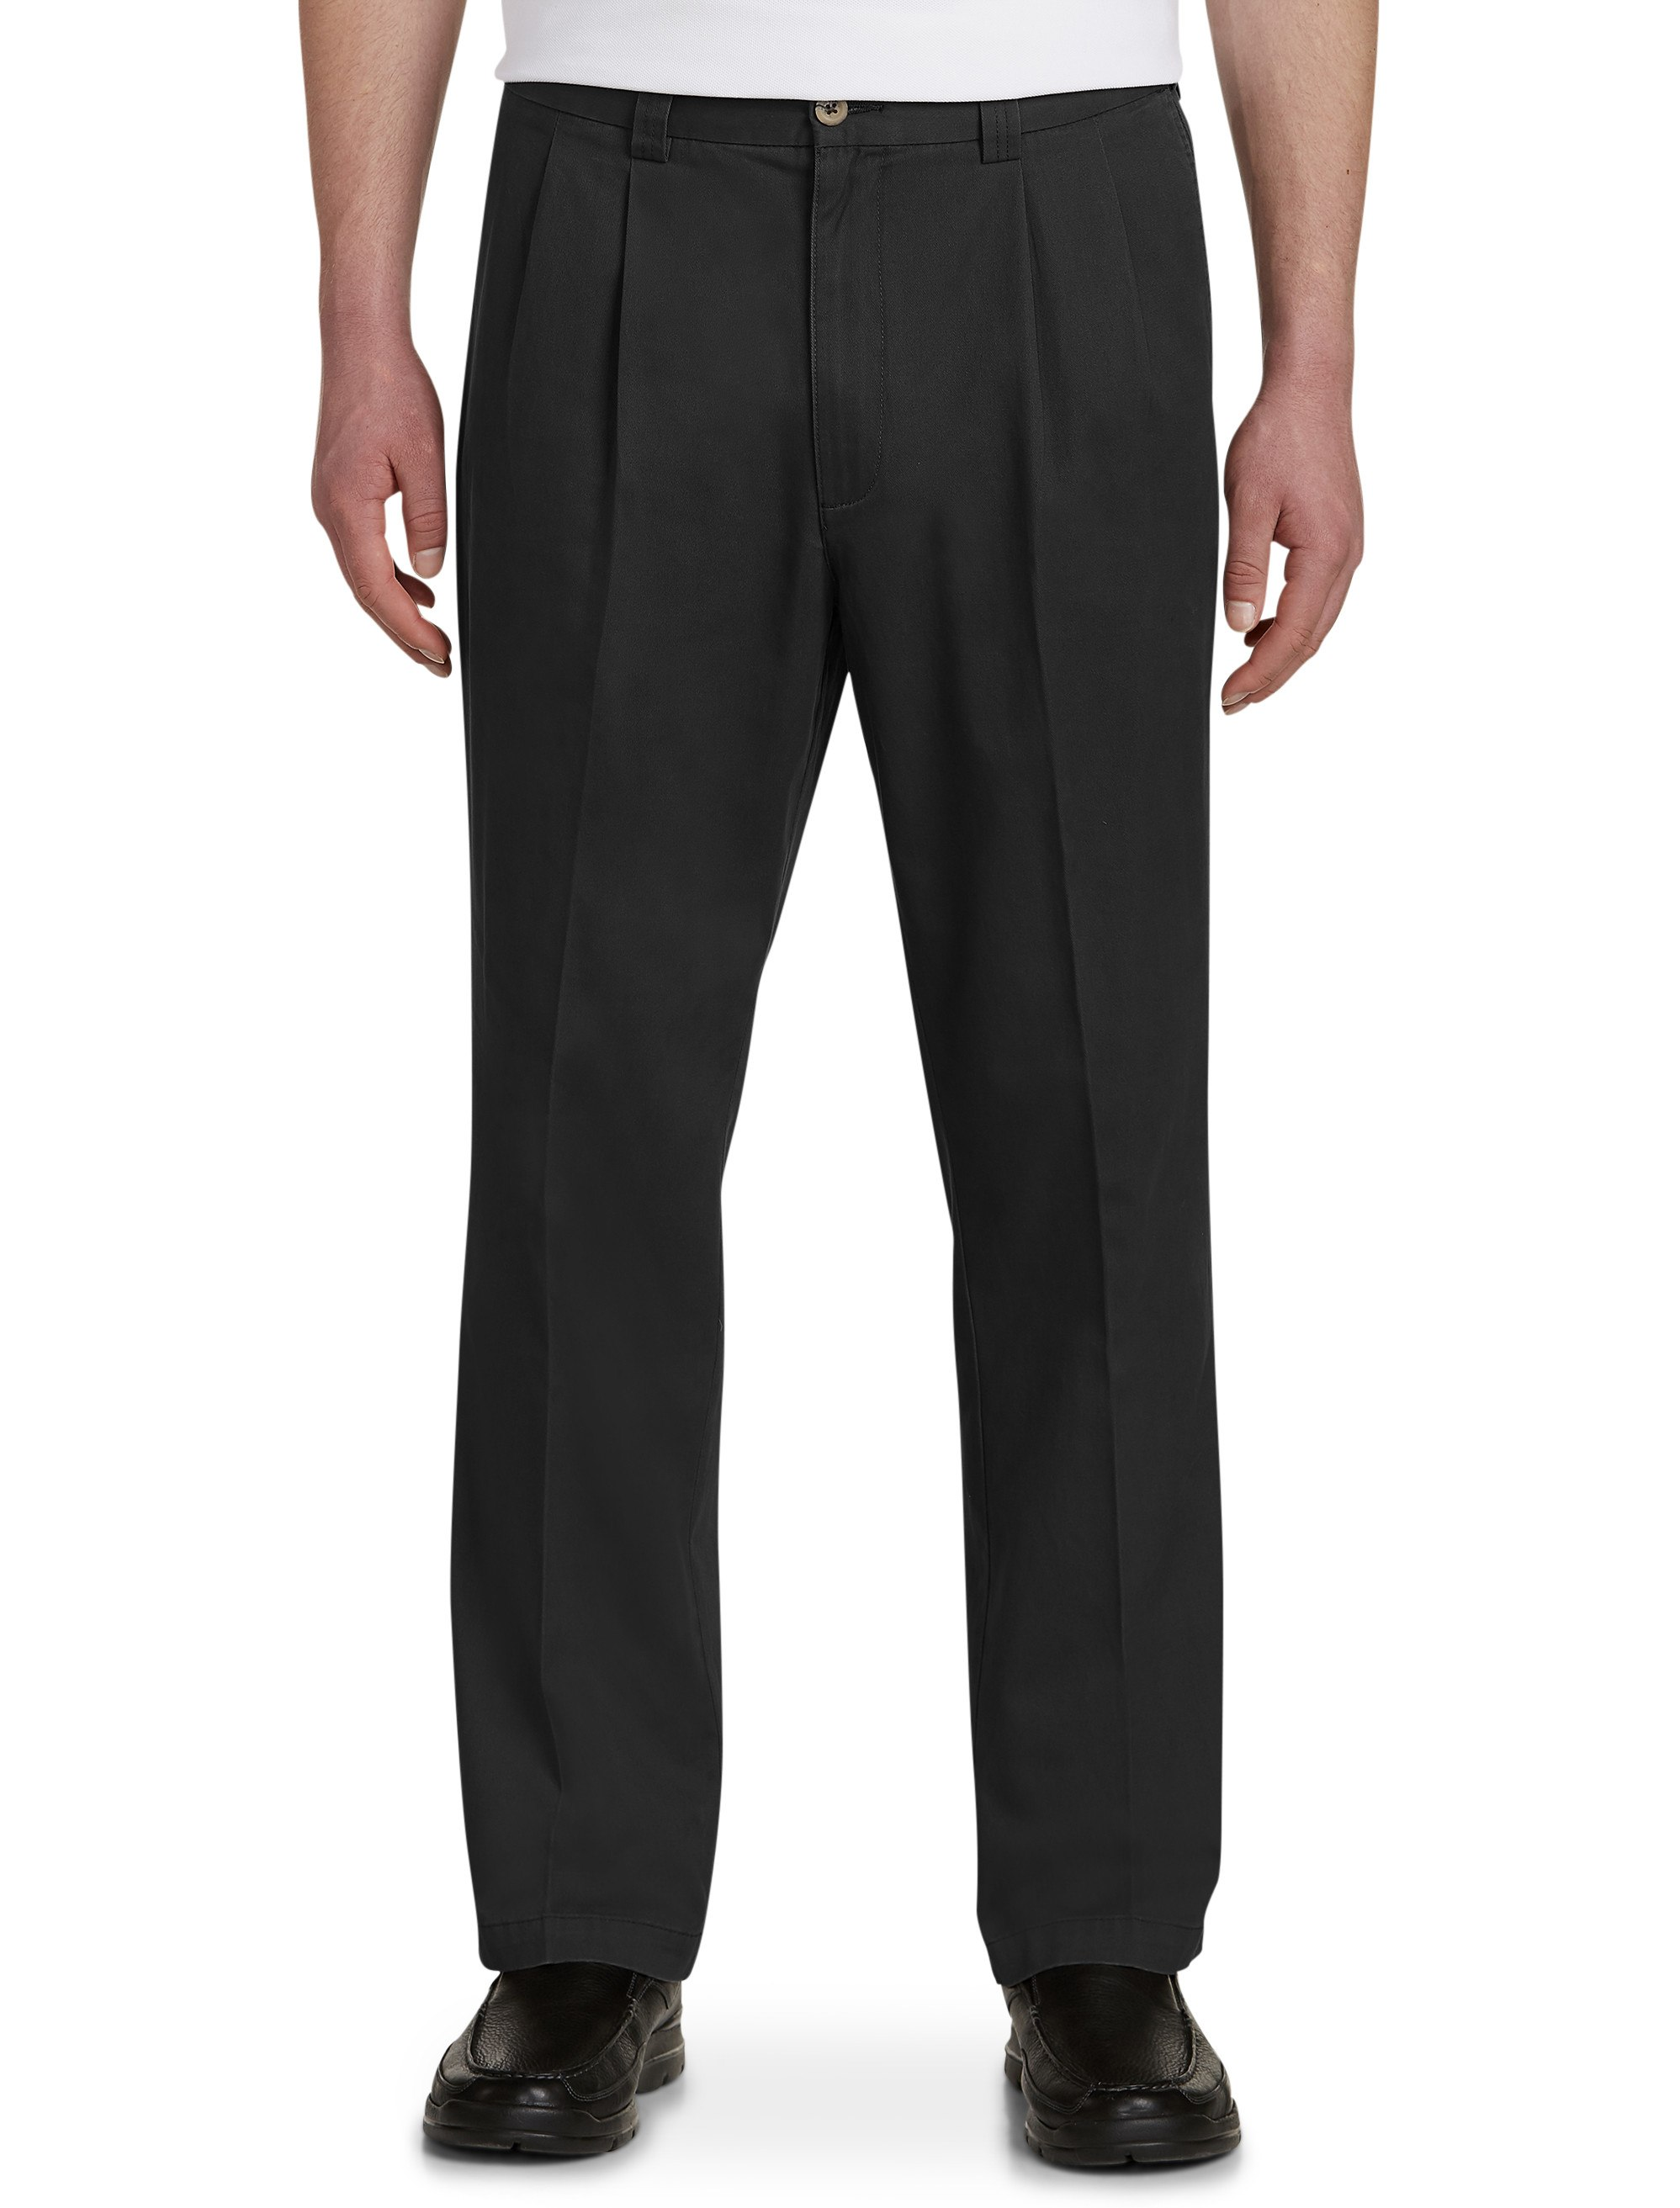 Men's Big & Tall Harbor Bay Waist-Relaxer Pleated Pants – Unhemmed